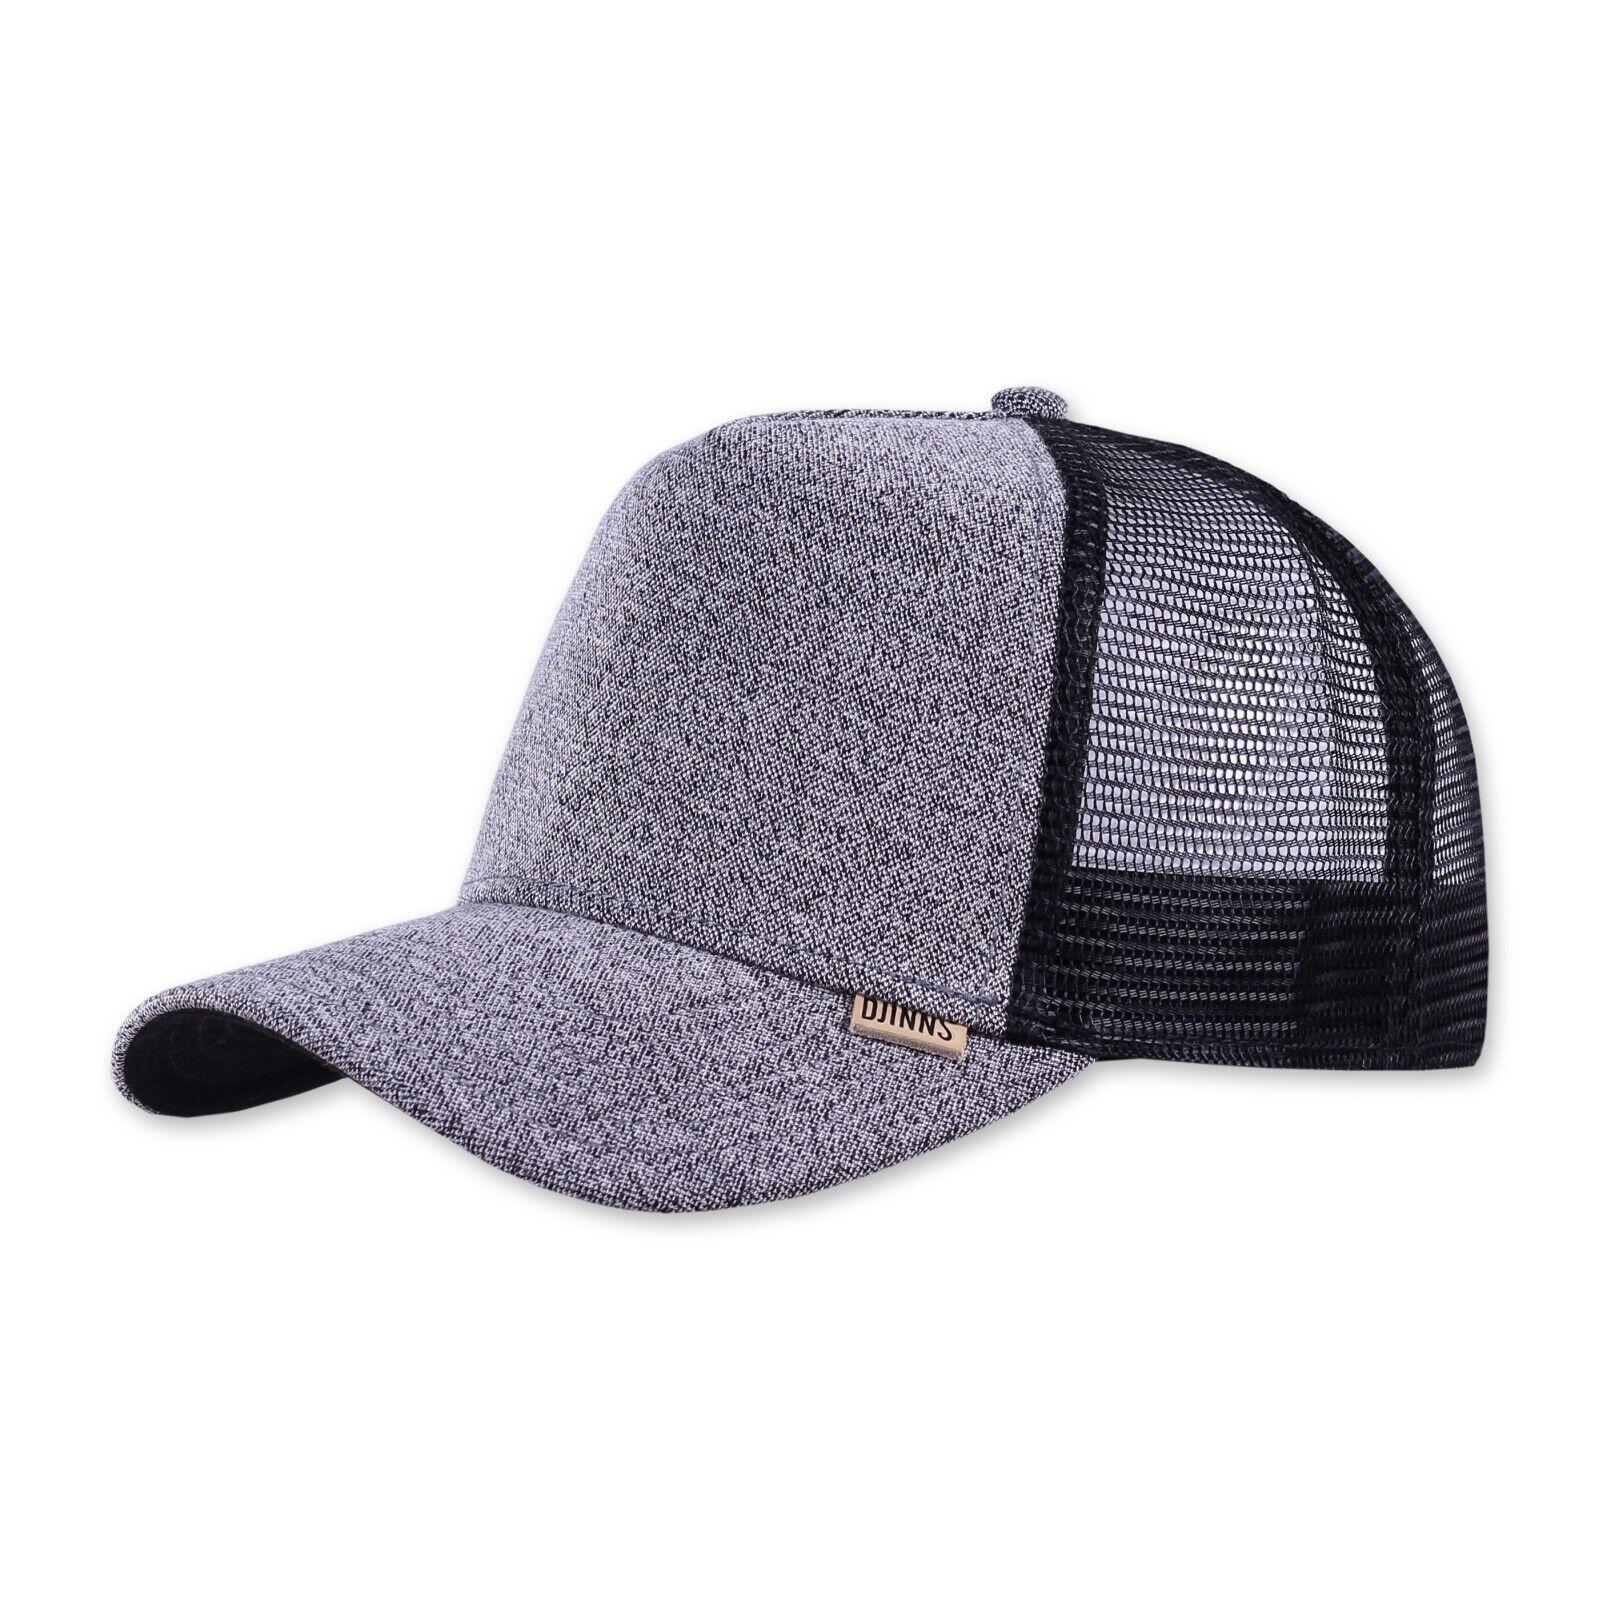 HFT Jersey Piqué Black